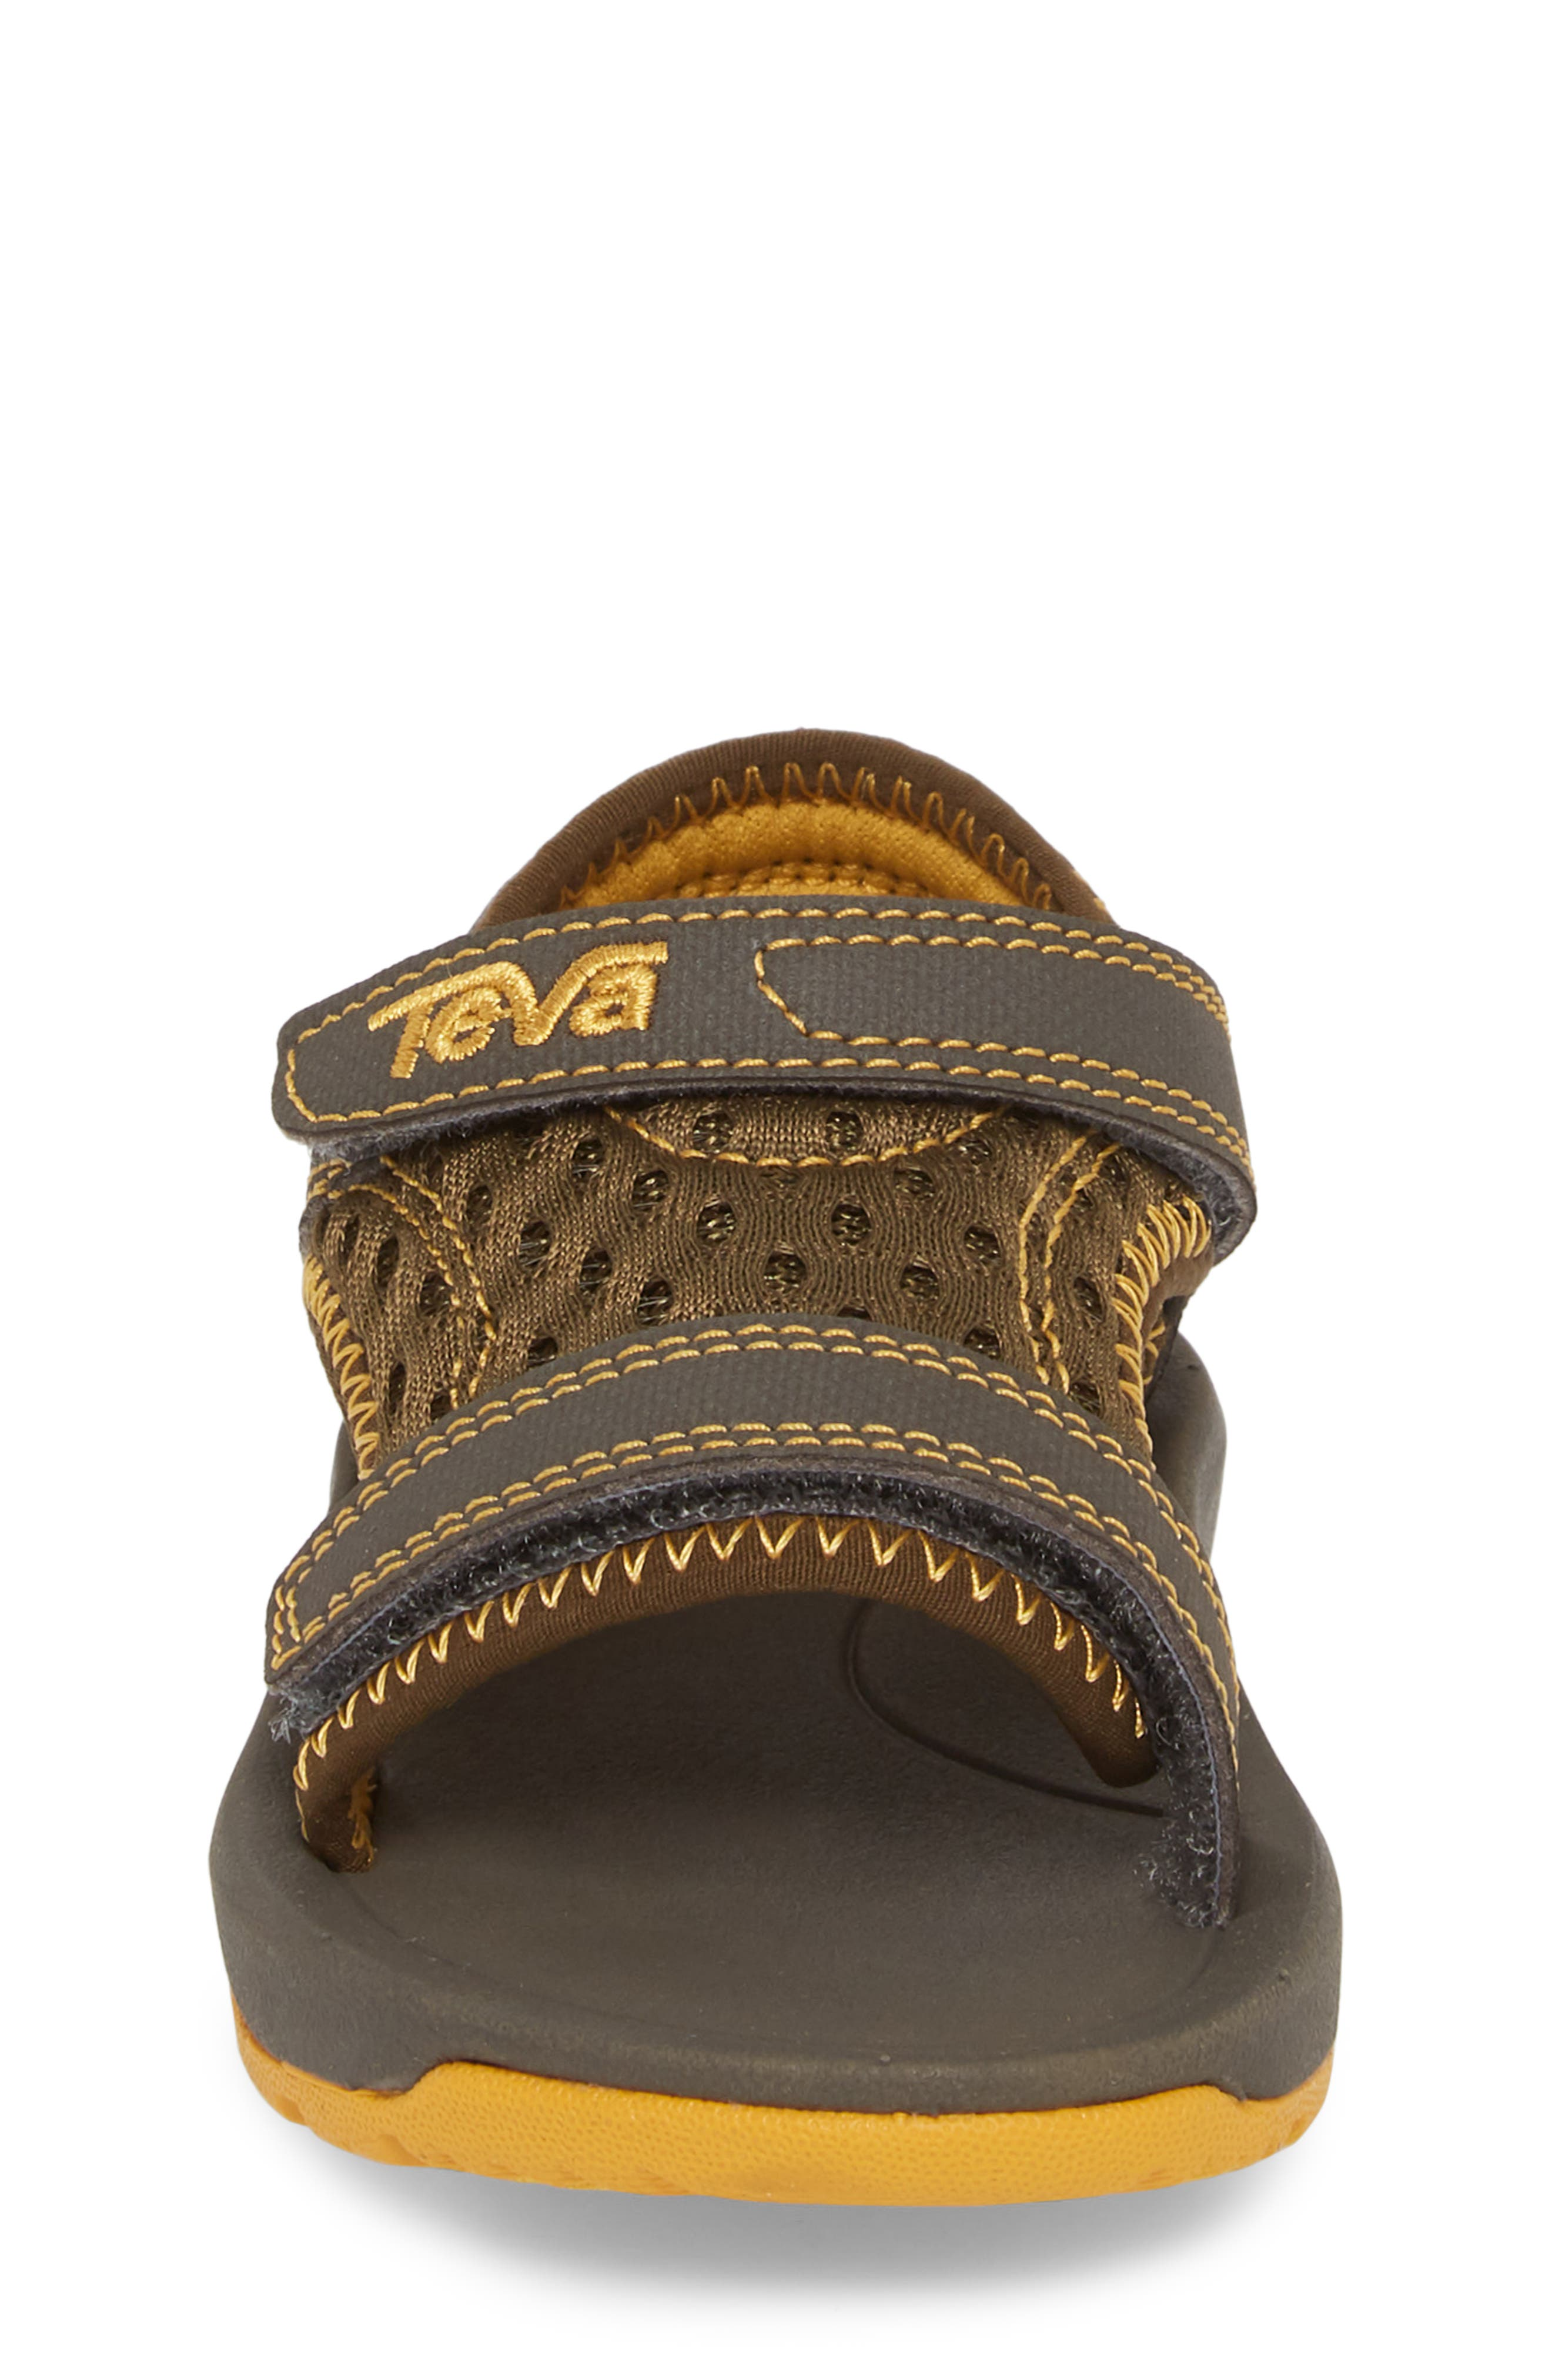 Psyclone XLT Sandal,                             Alternate thumbnail 4, color,                             Dark Olive